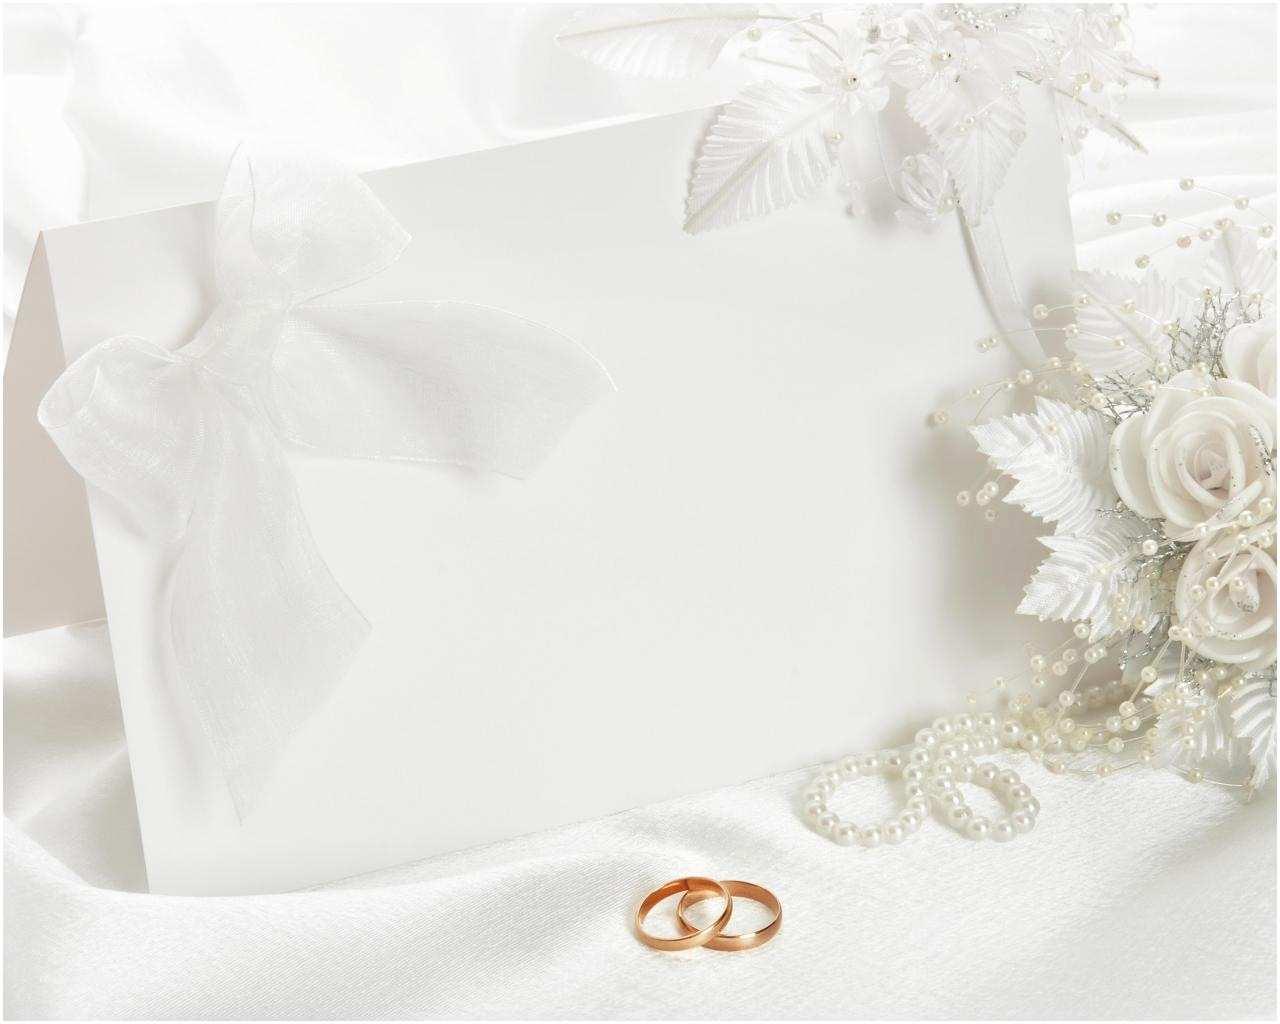 Wedding Invitation Pictures Background Elegant Wedding Wallpaper Wallpapersafari